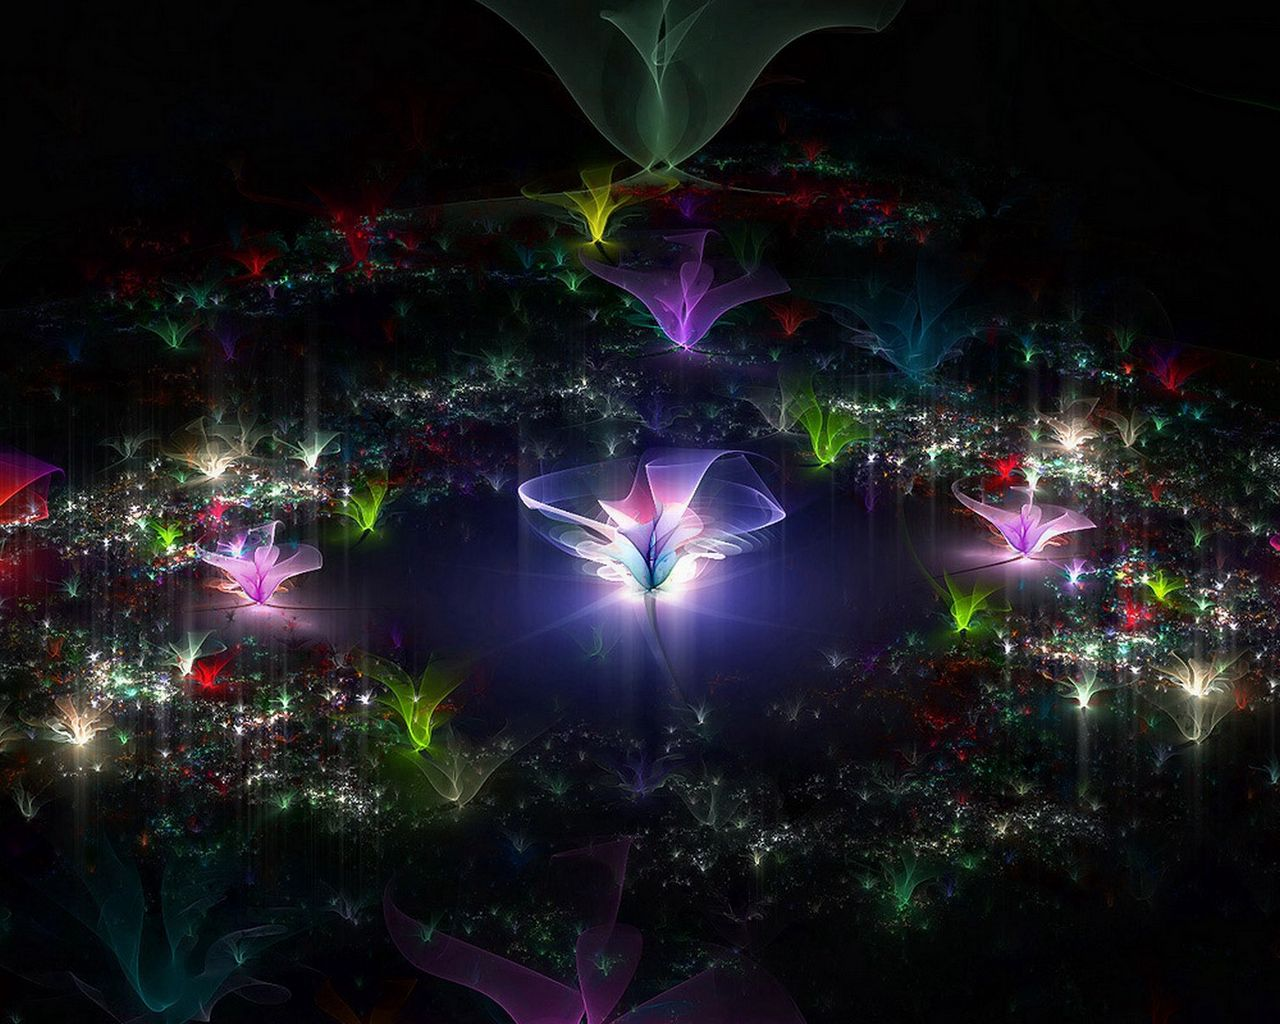 1280x1024 Wallpaper fractal, flying, dark, background